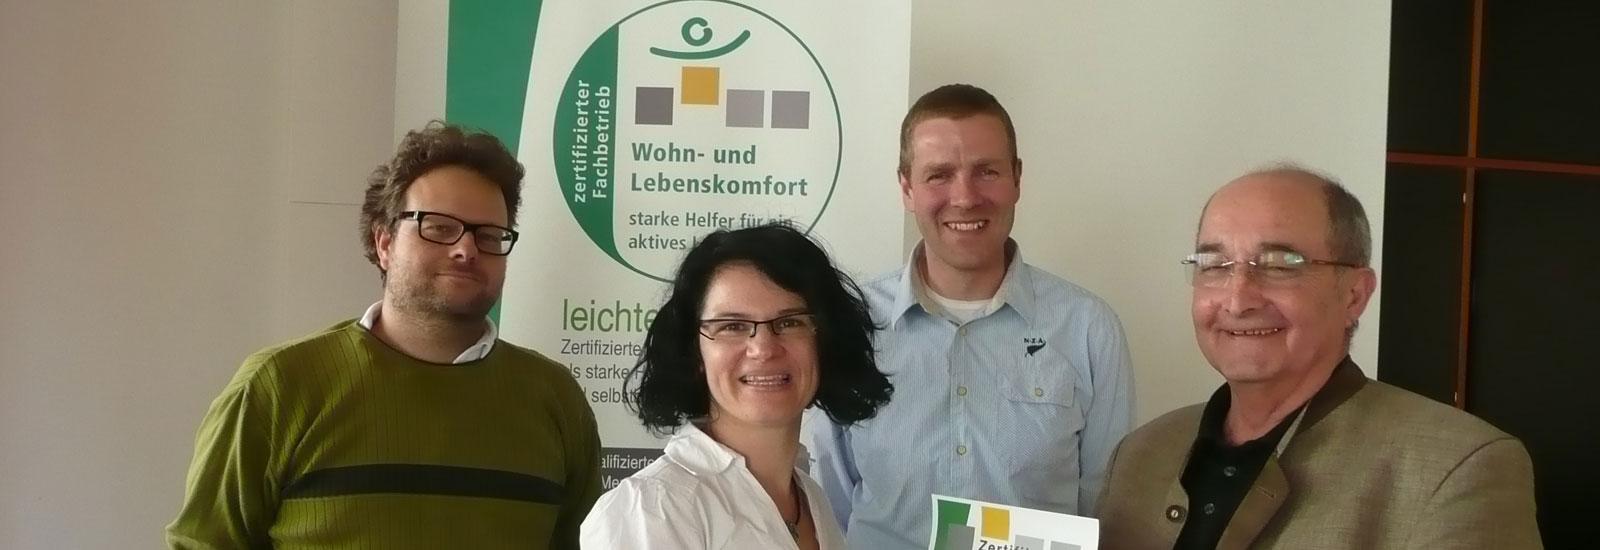 "Zertifizierter Fachbetrieb ""leichter leben"""